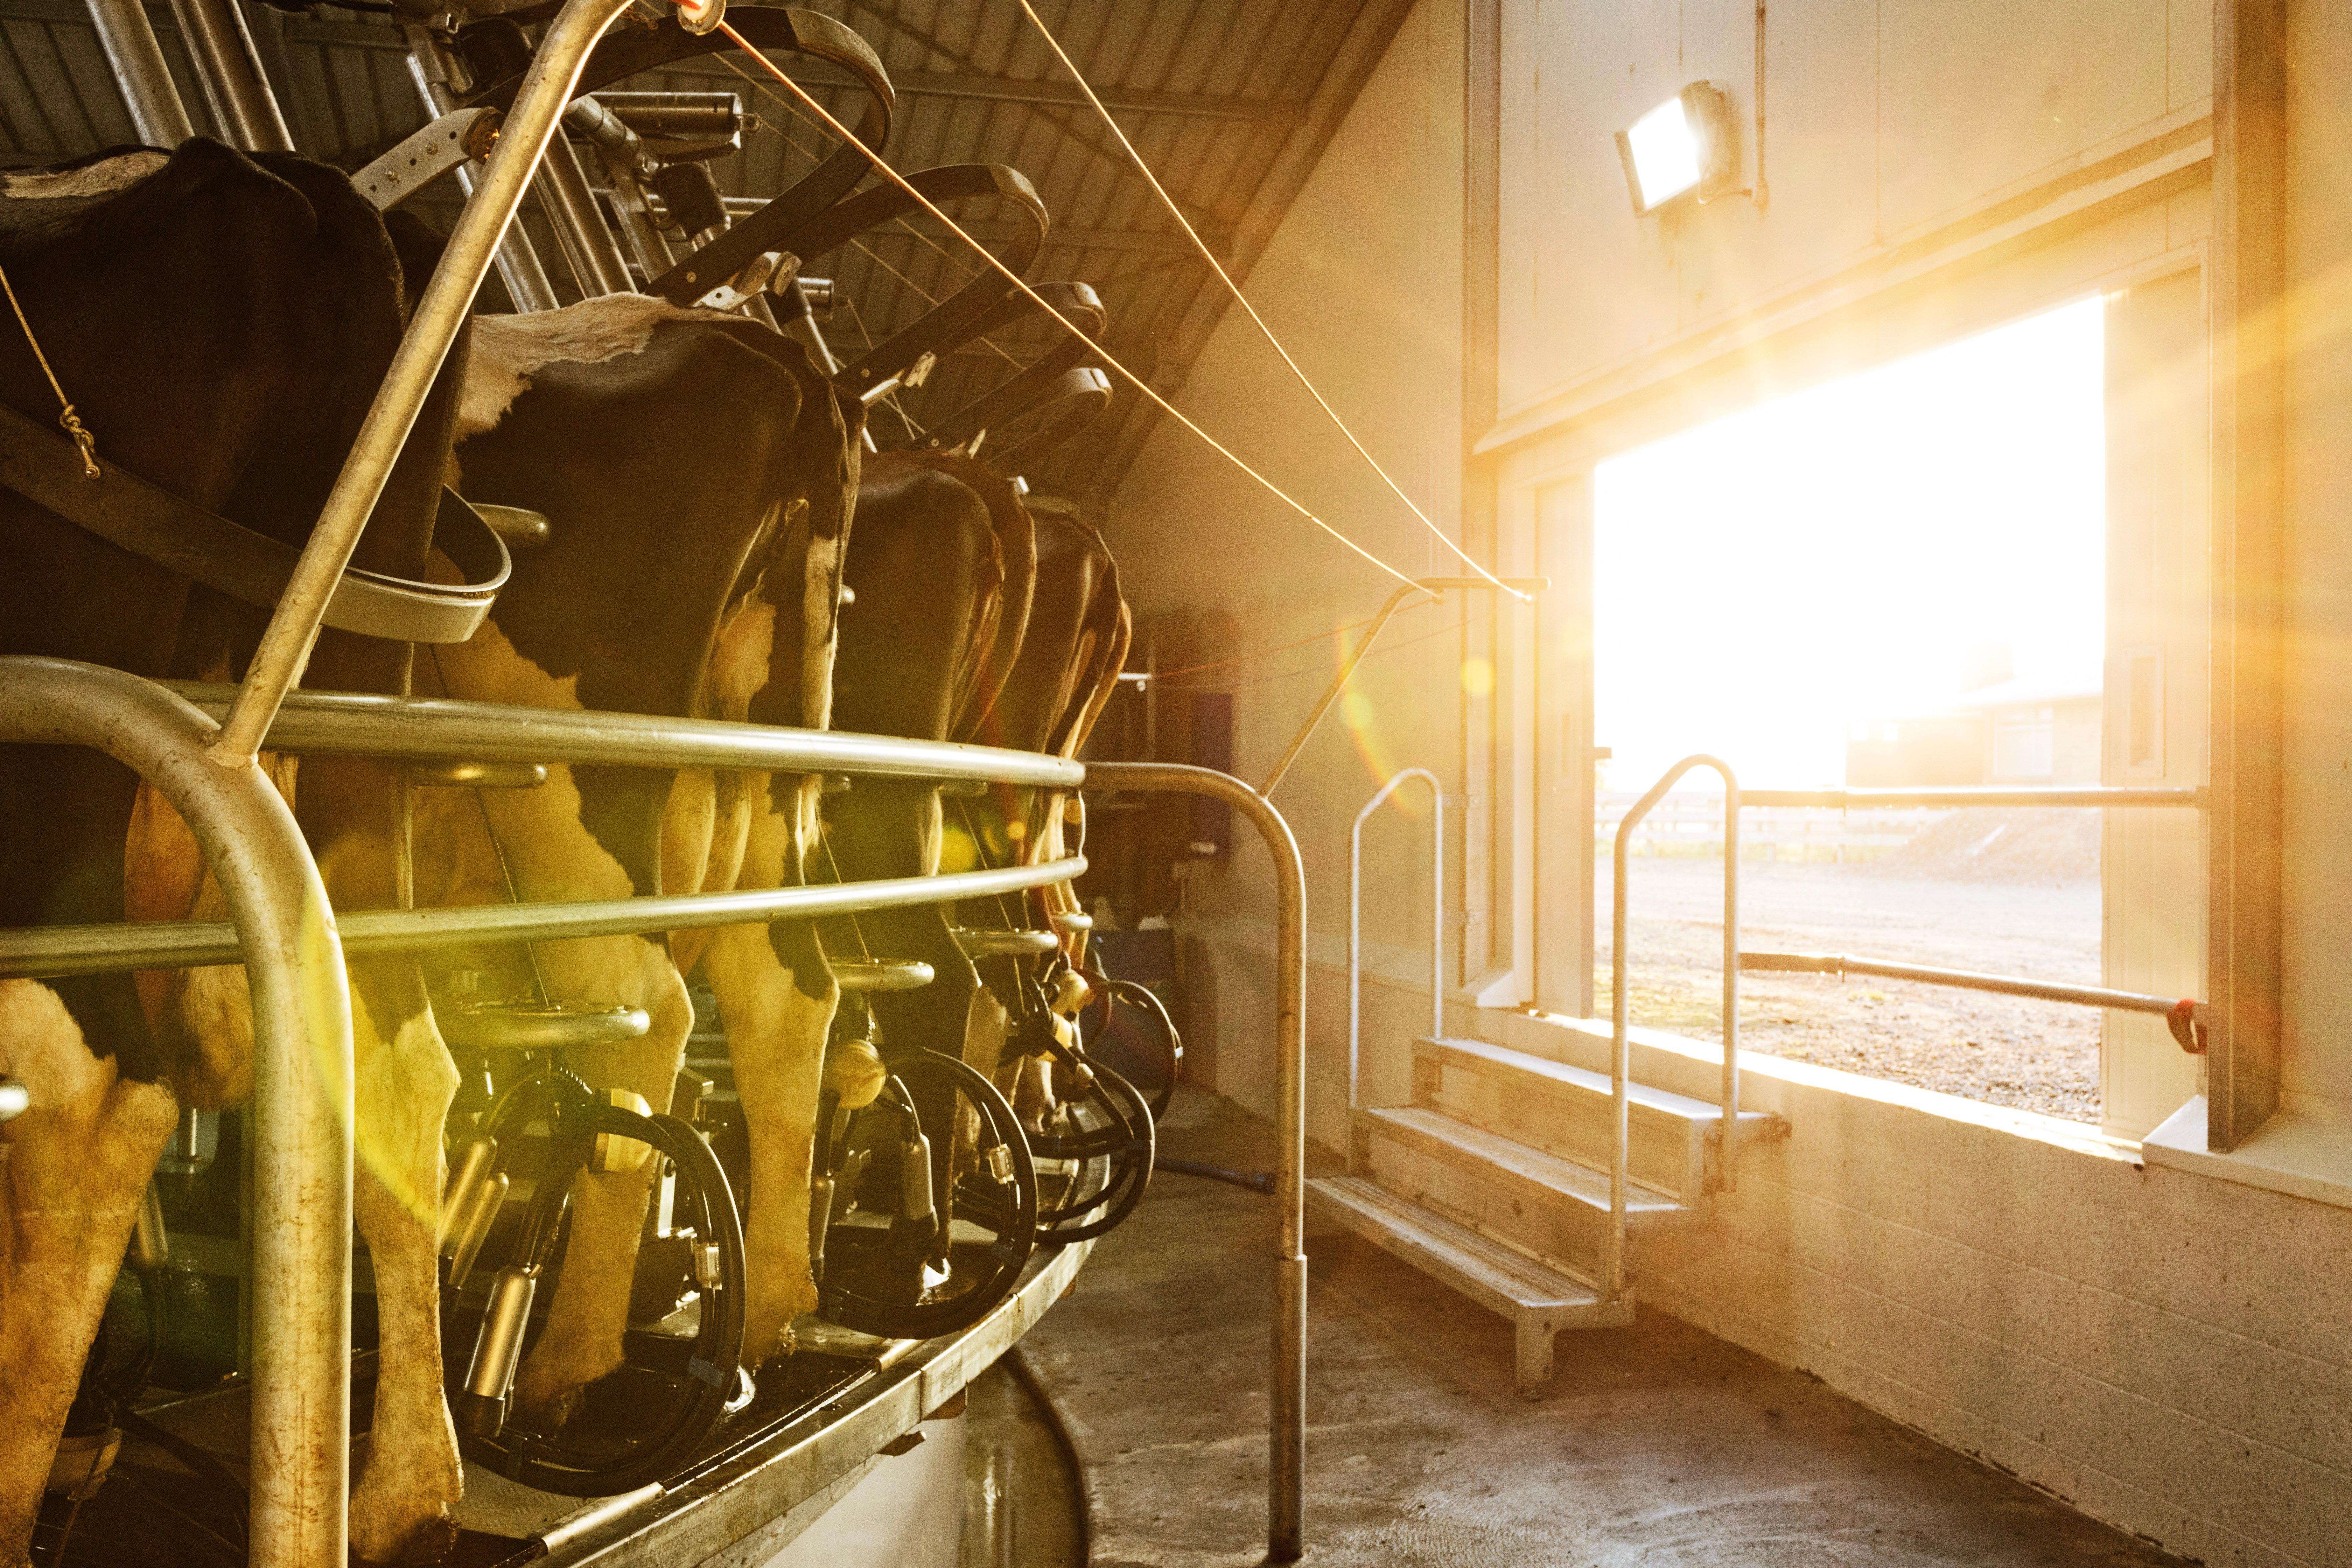 Sunrise through milking shed door